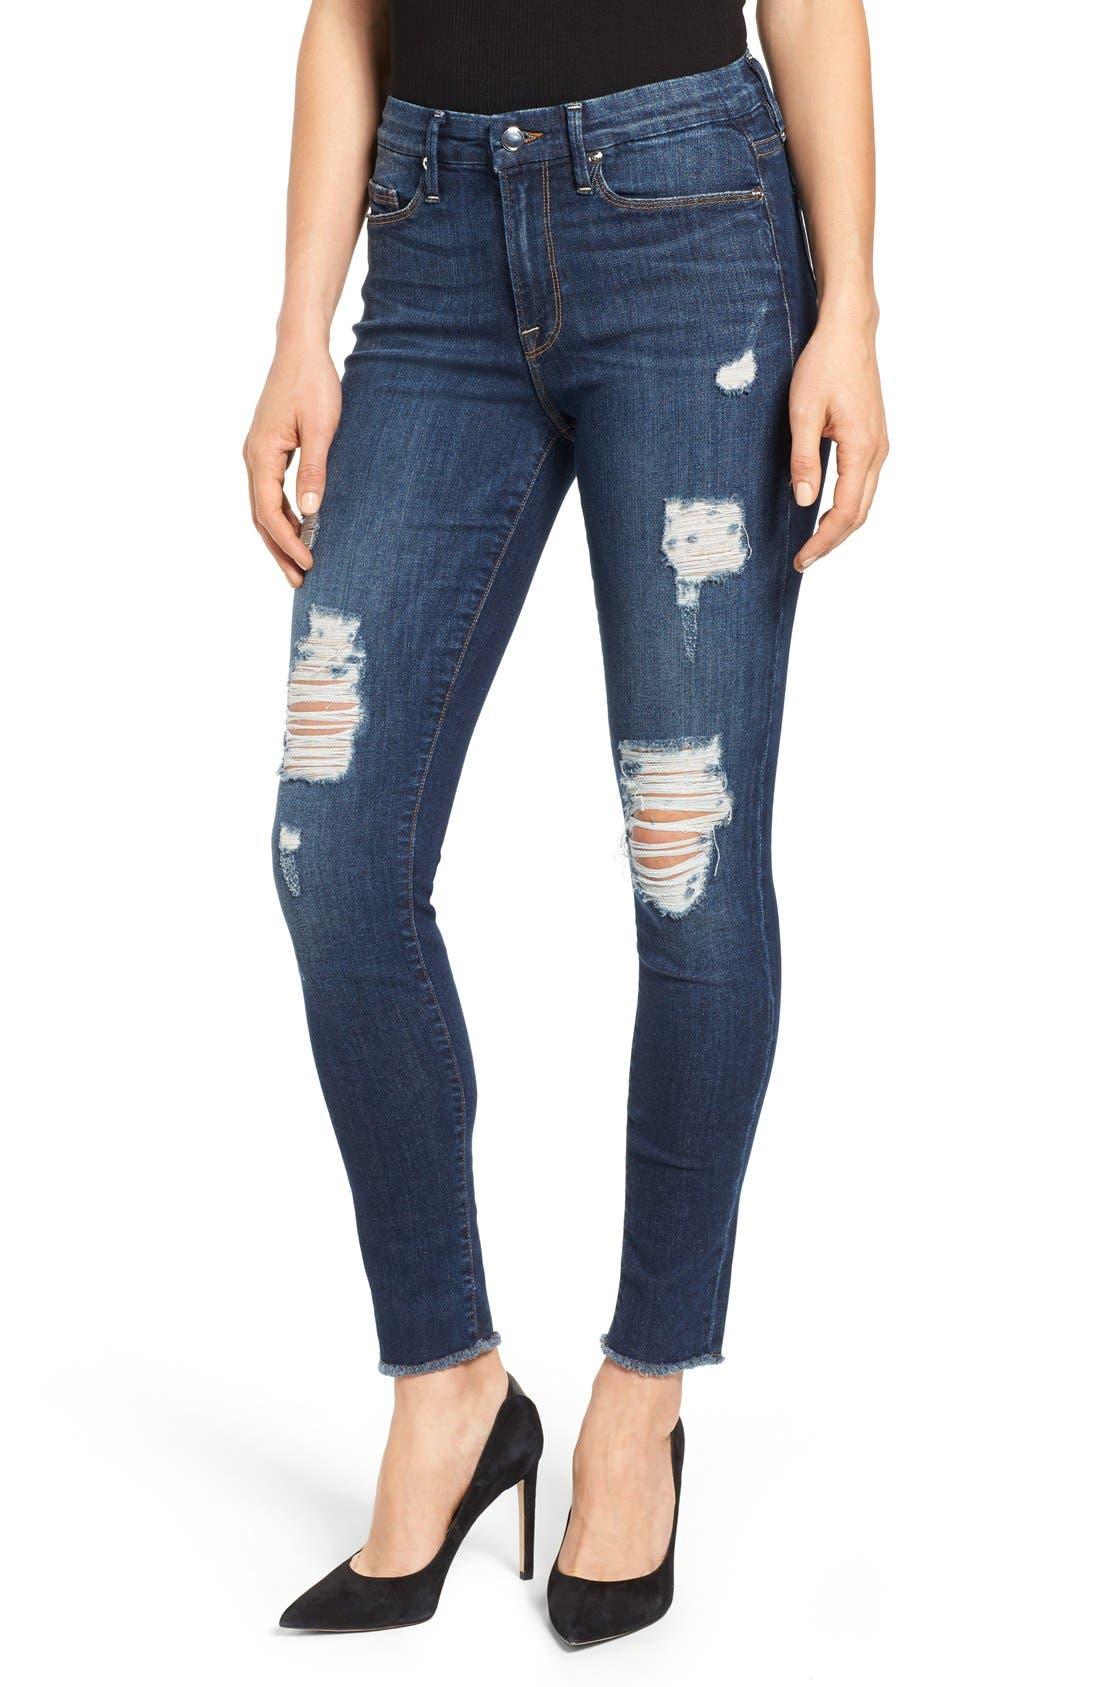 D jeans high waist ankle plus